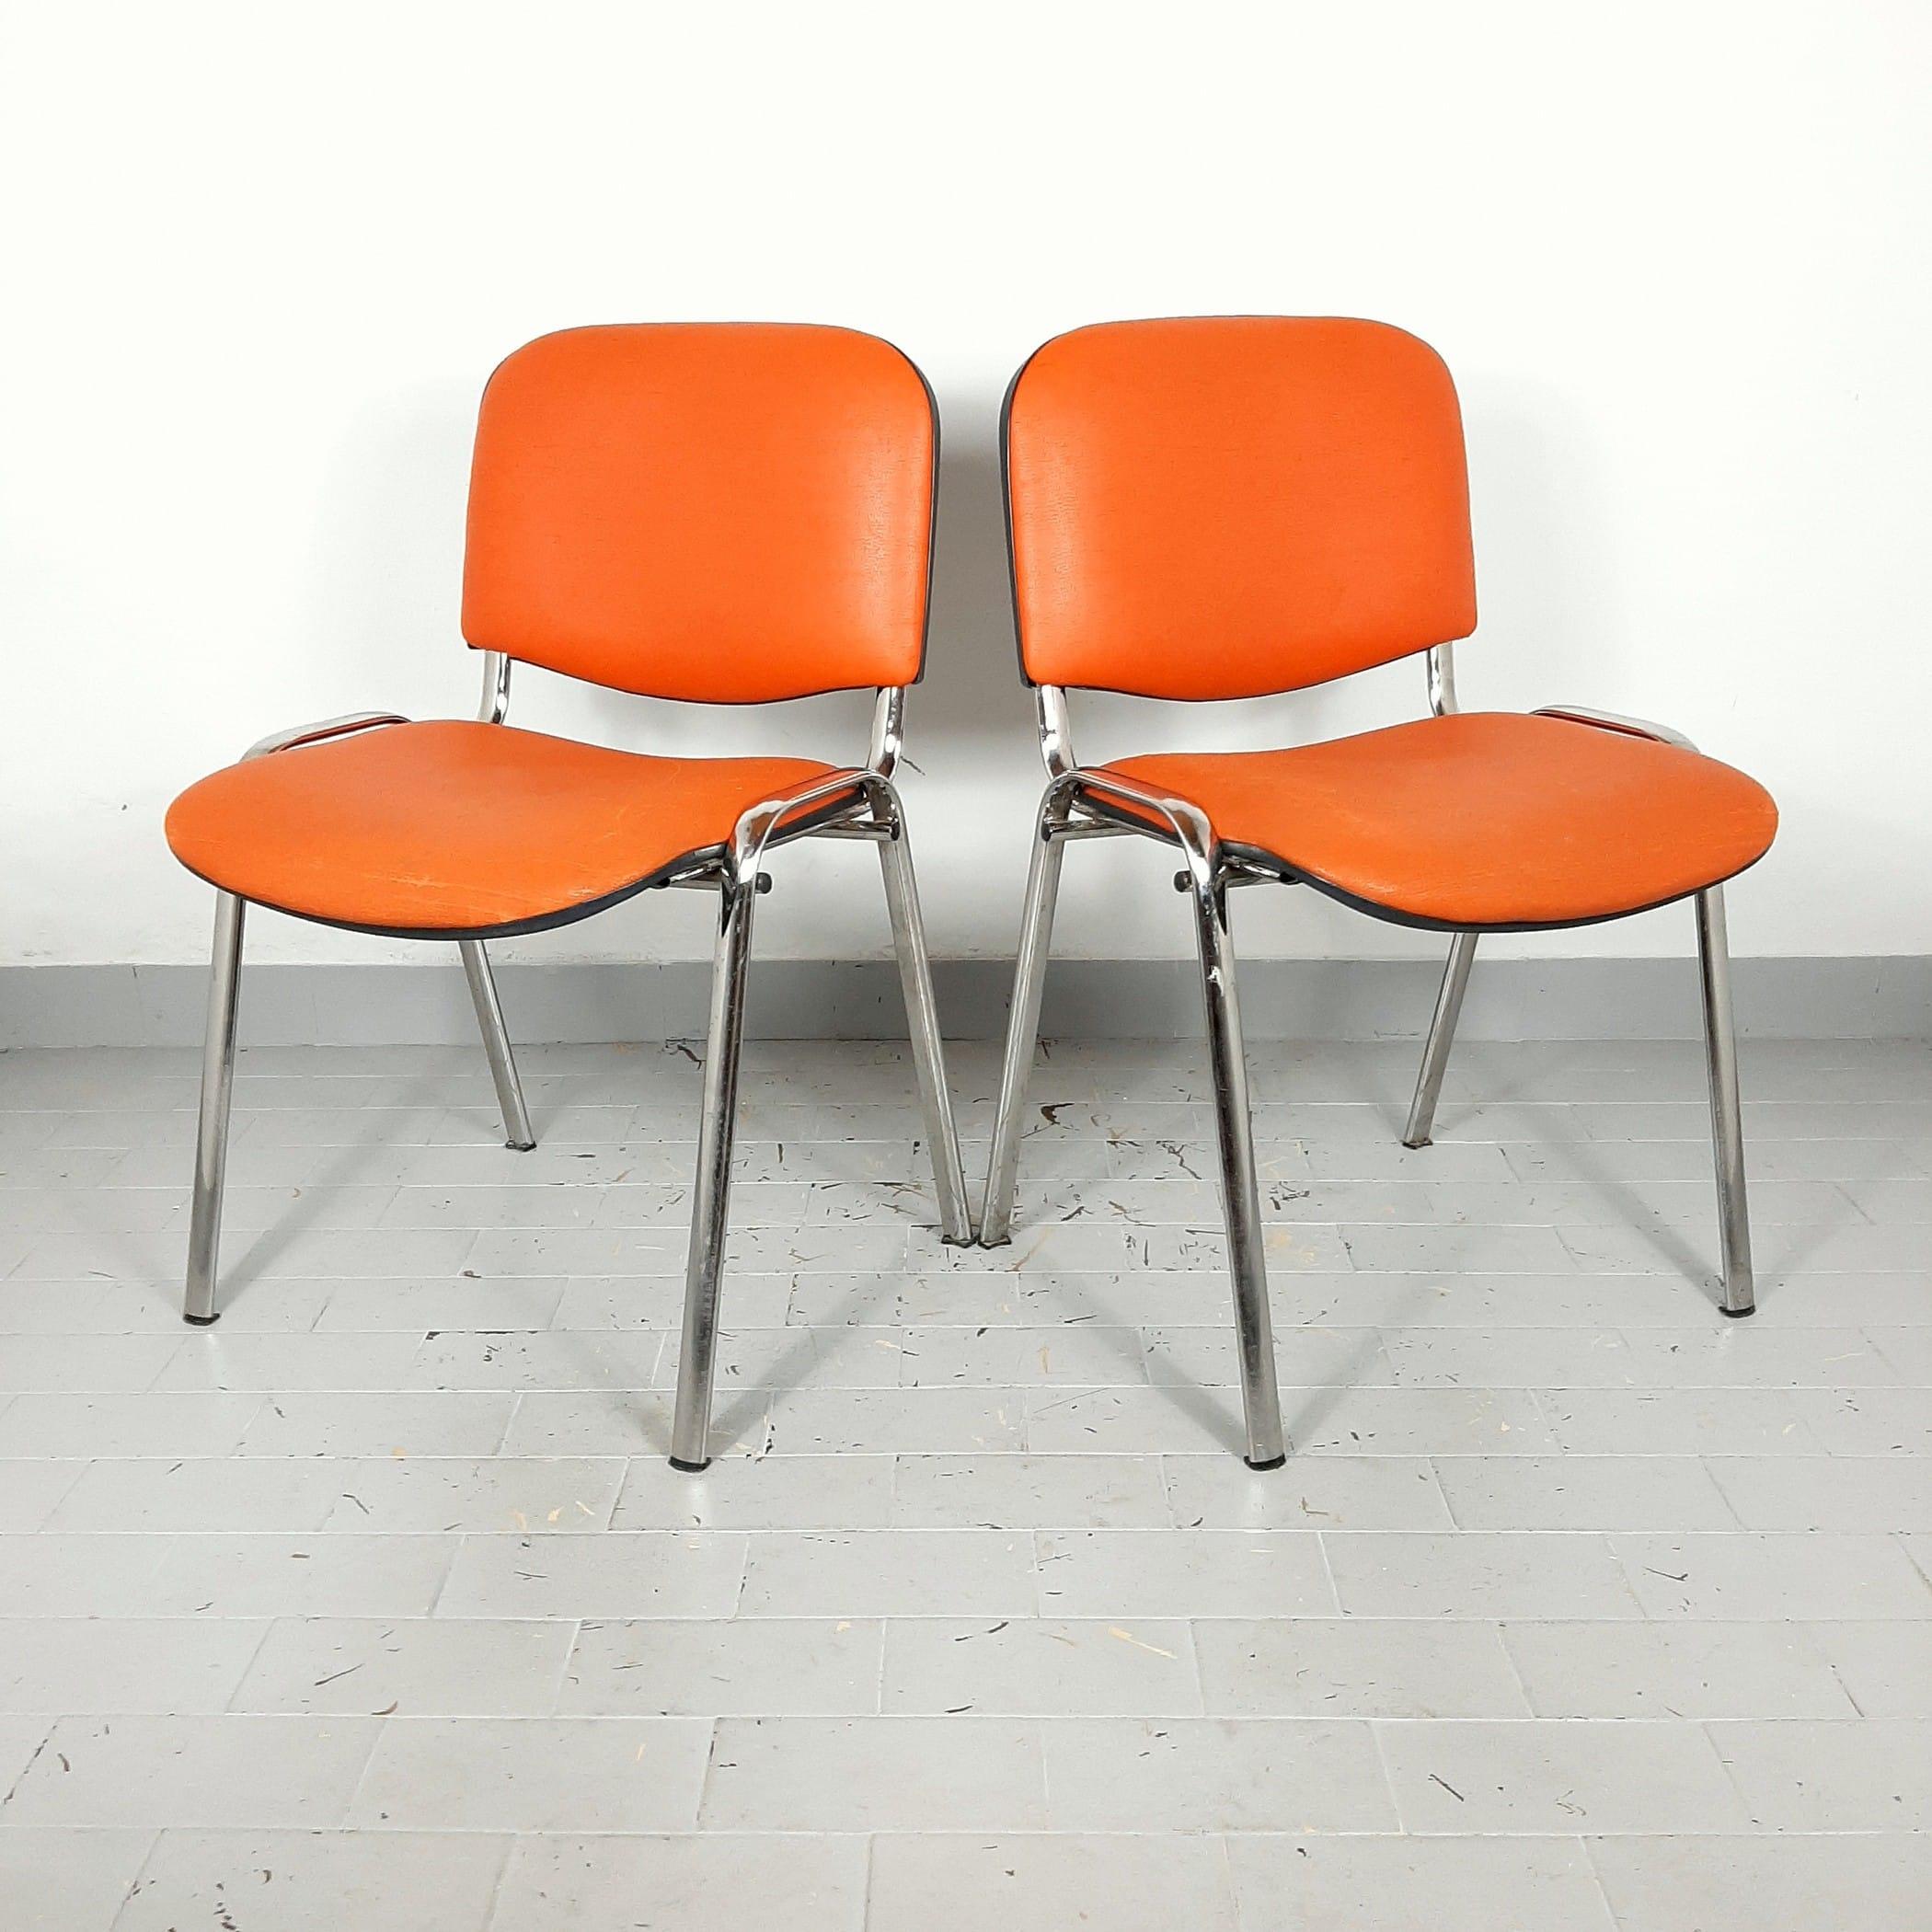 Retro office chair Yugoslavia '80s Orange desk chair